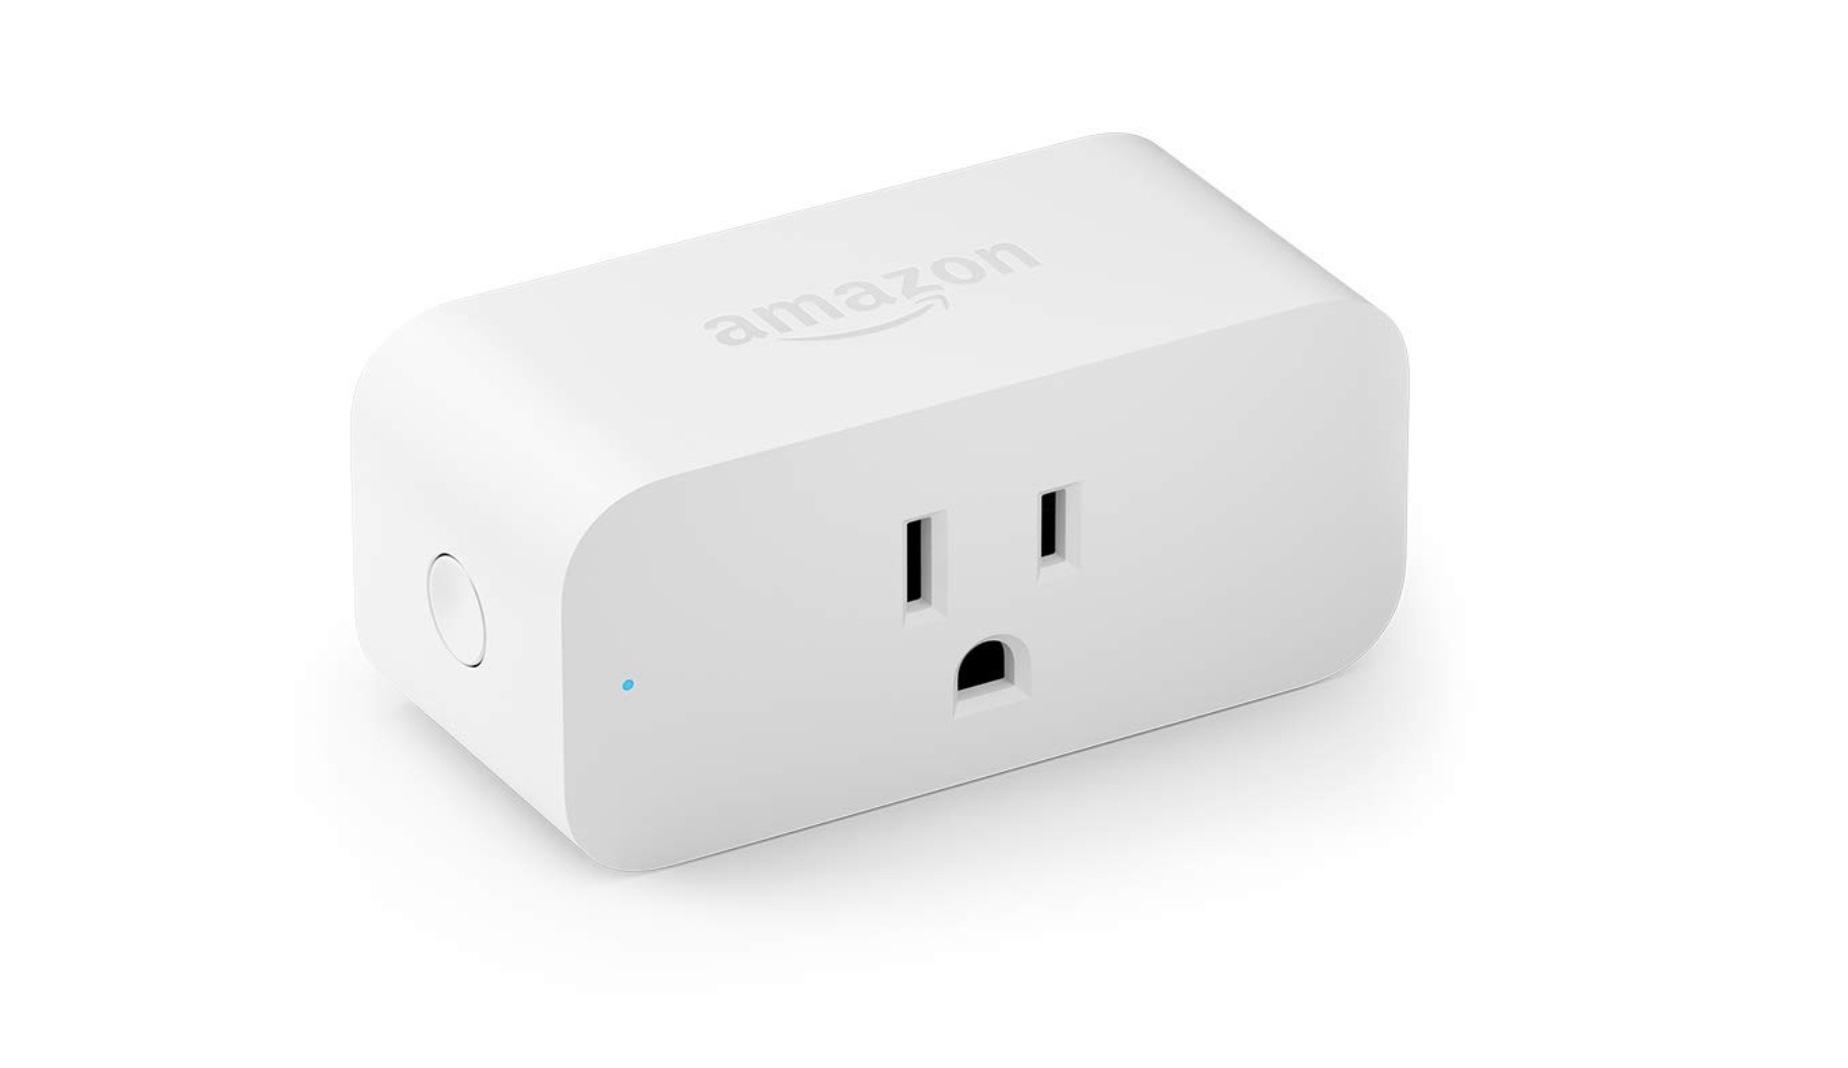 An Amazon Smart Plug Alexa device